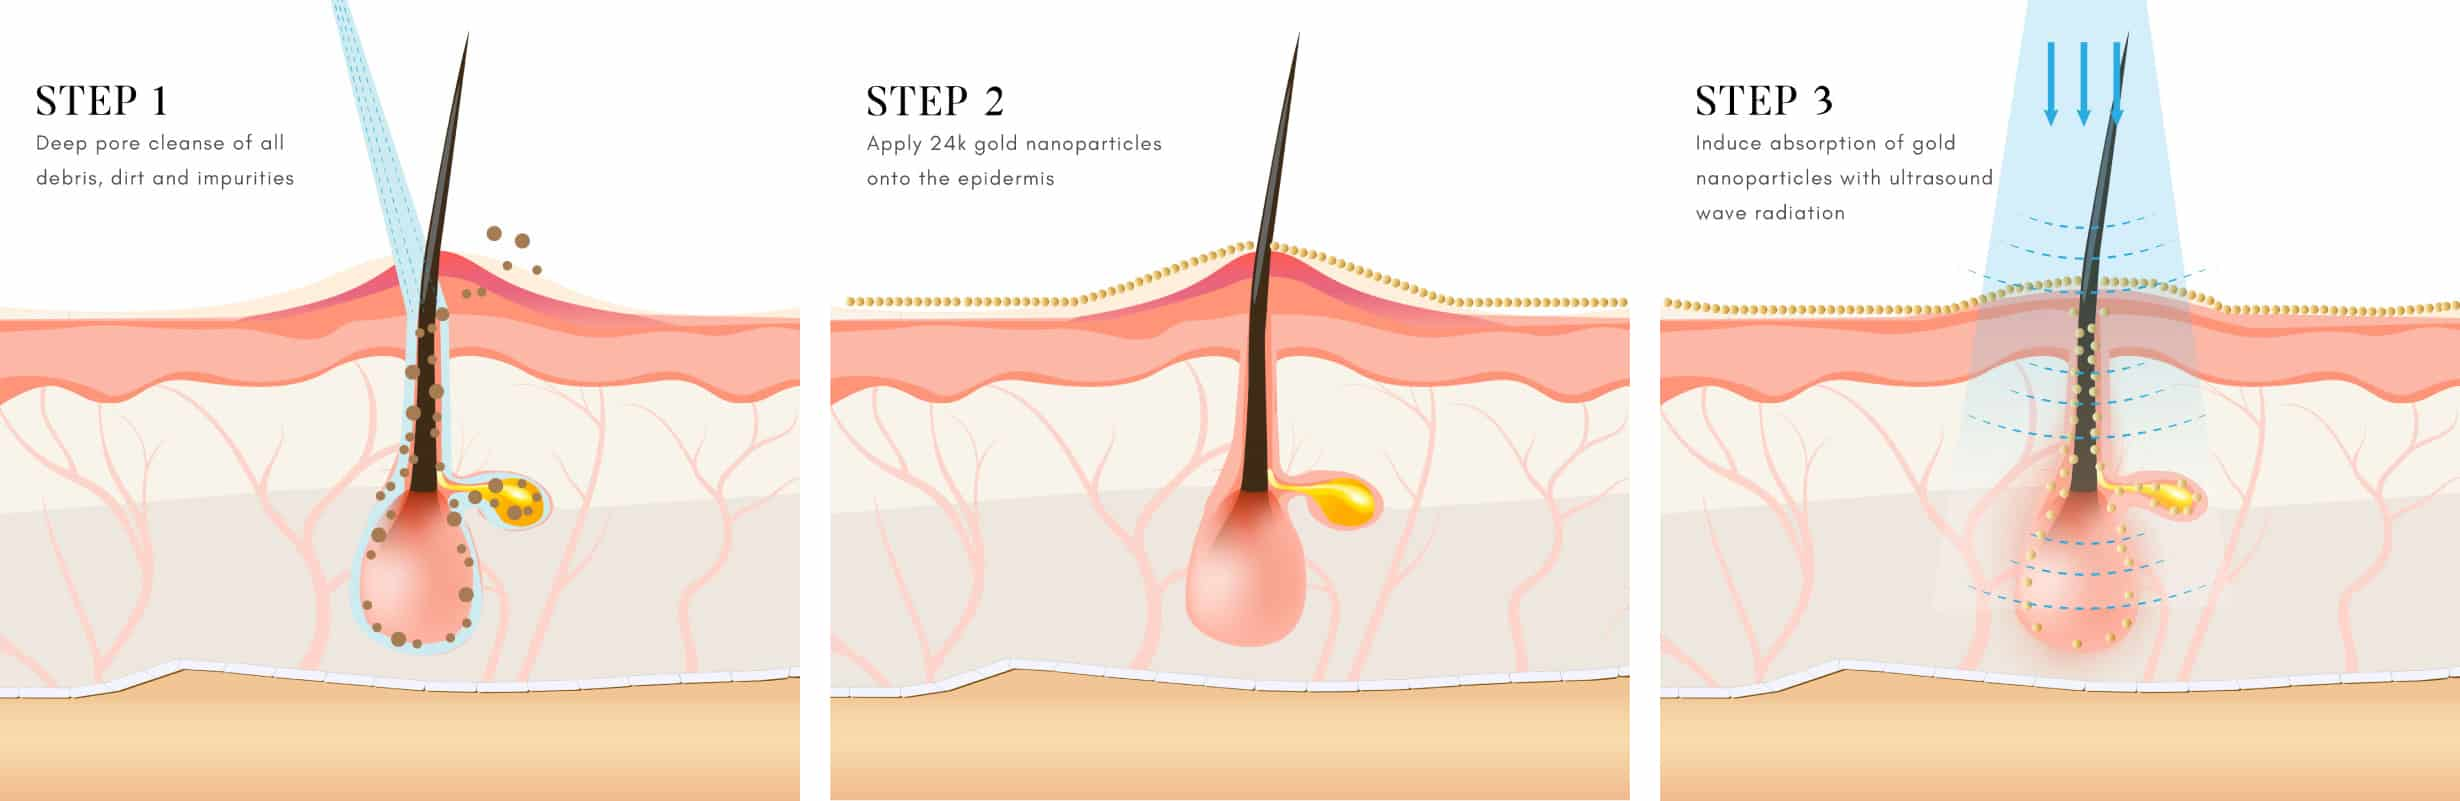 acne treatment diagram steps